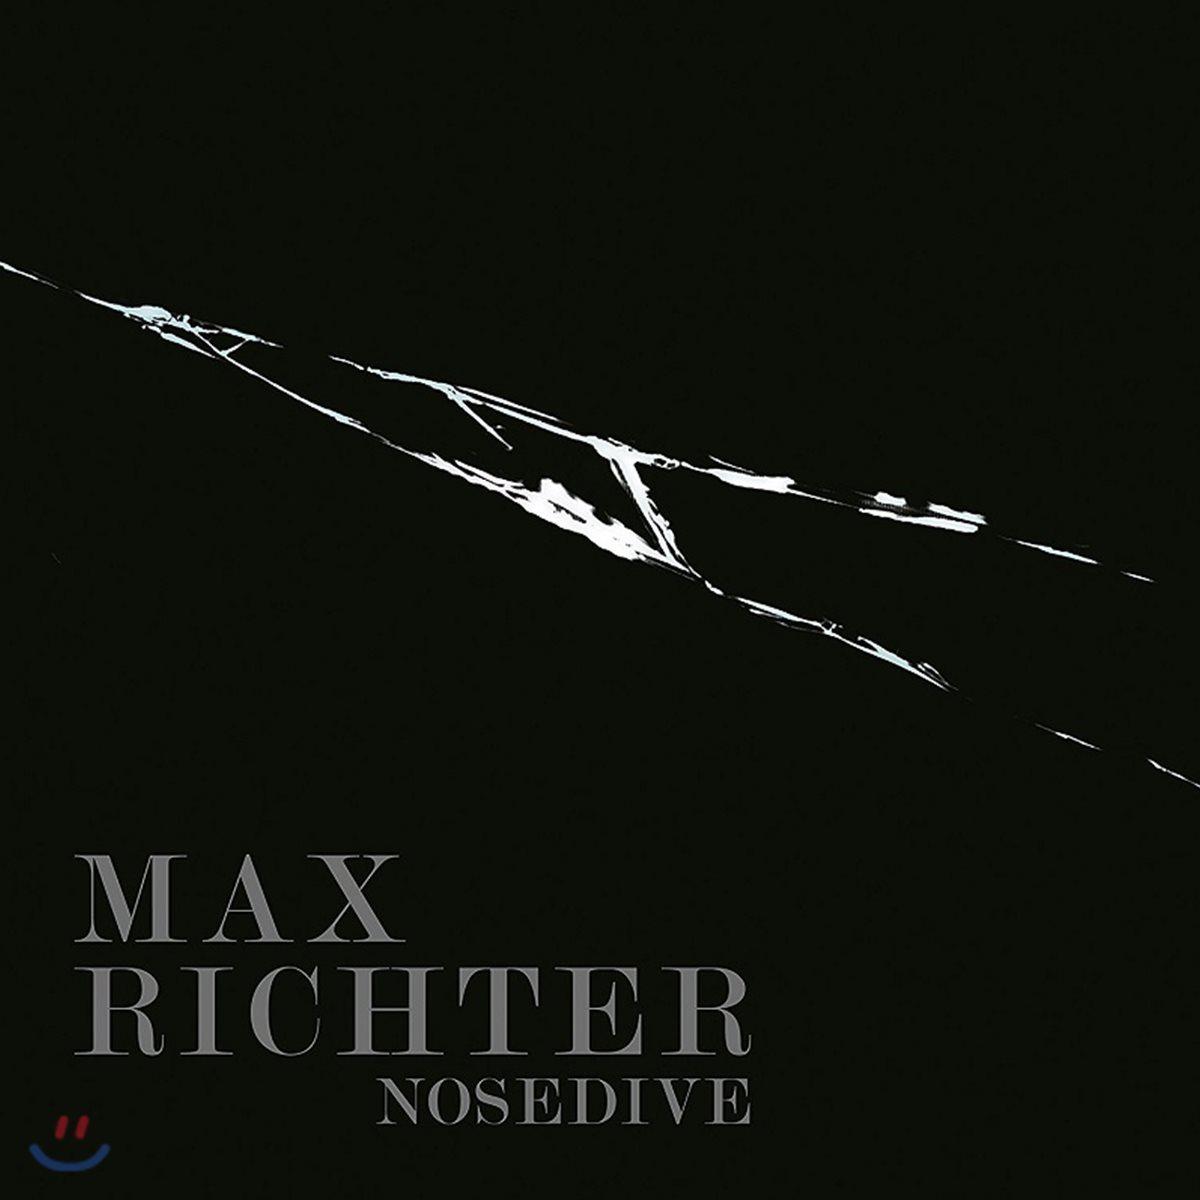 Max Richter 막스 리히터: TV시리즈 '블랙 미러 시즌3 에피소드 1: 추락 편' 사운드트랙 (Black Mirror: Nosedive OST) [LP]